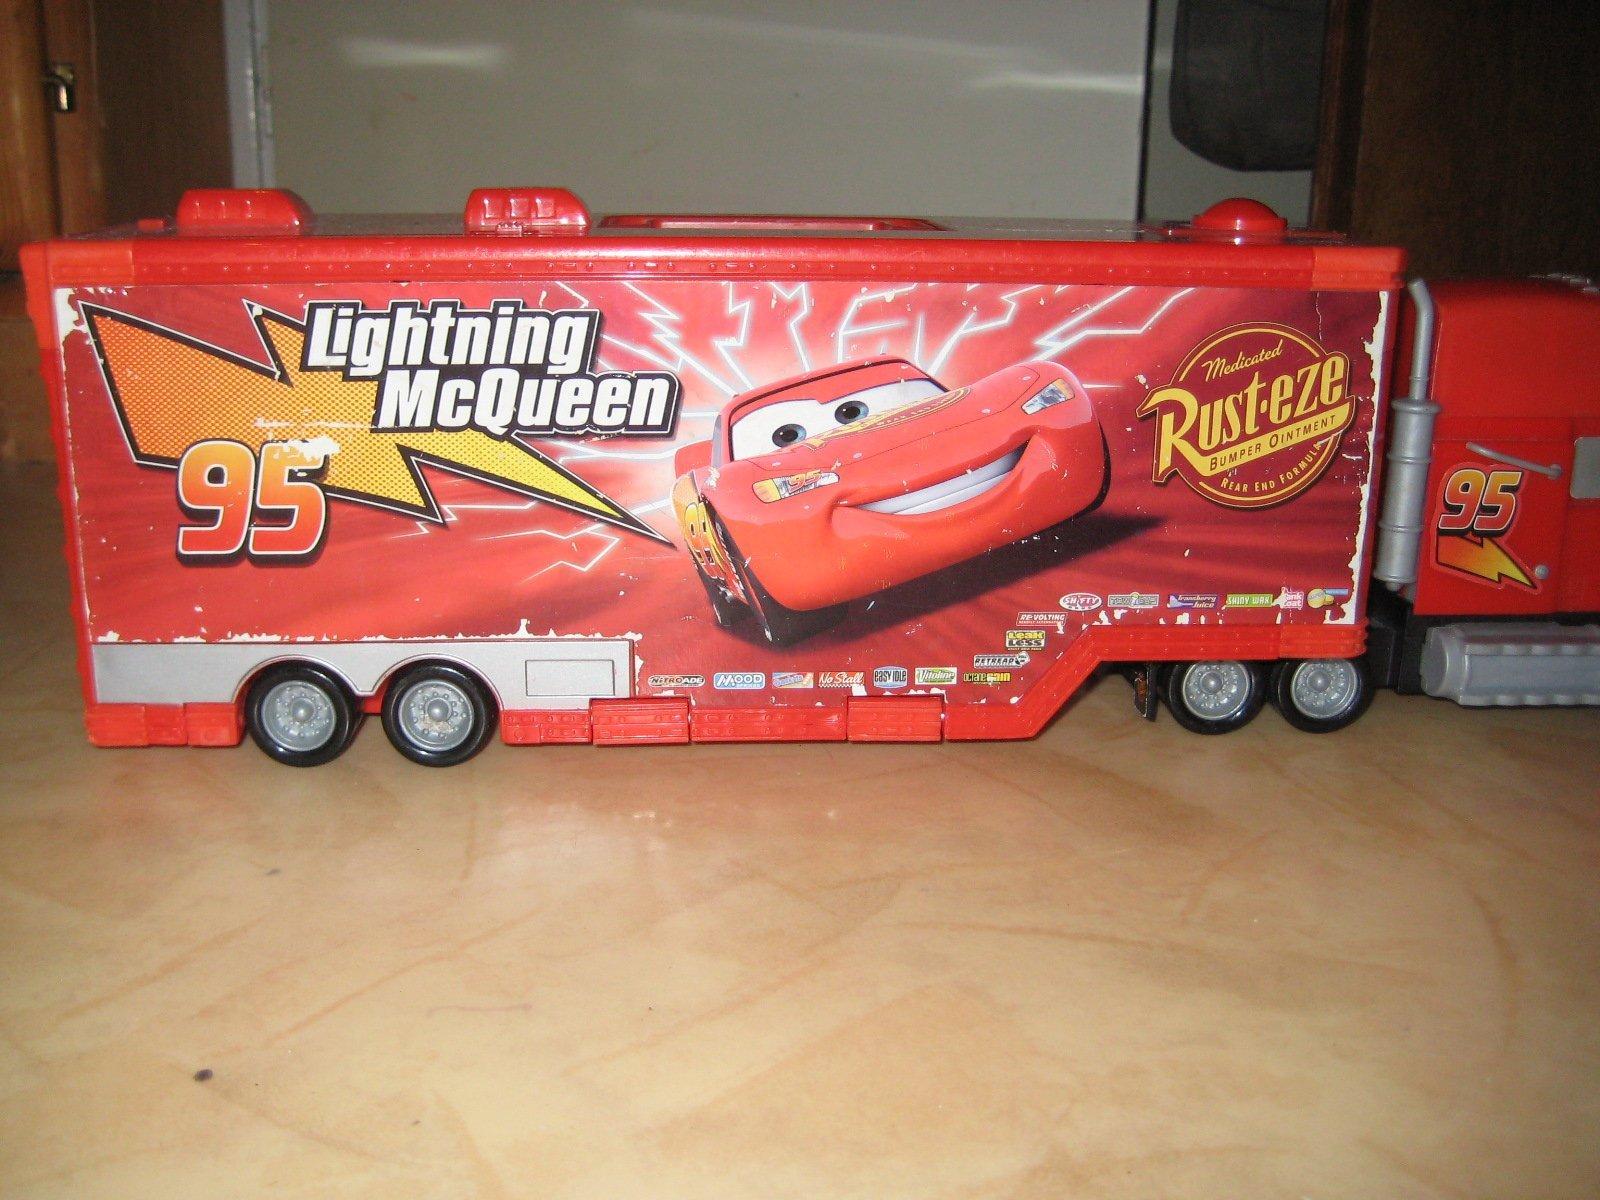 Kendte Blixten McQueen Cars 3 tävlingstrailer (lastbil.. (357793790) ᐈ LI-72